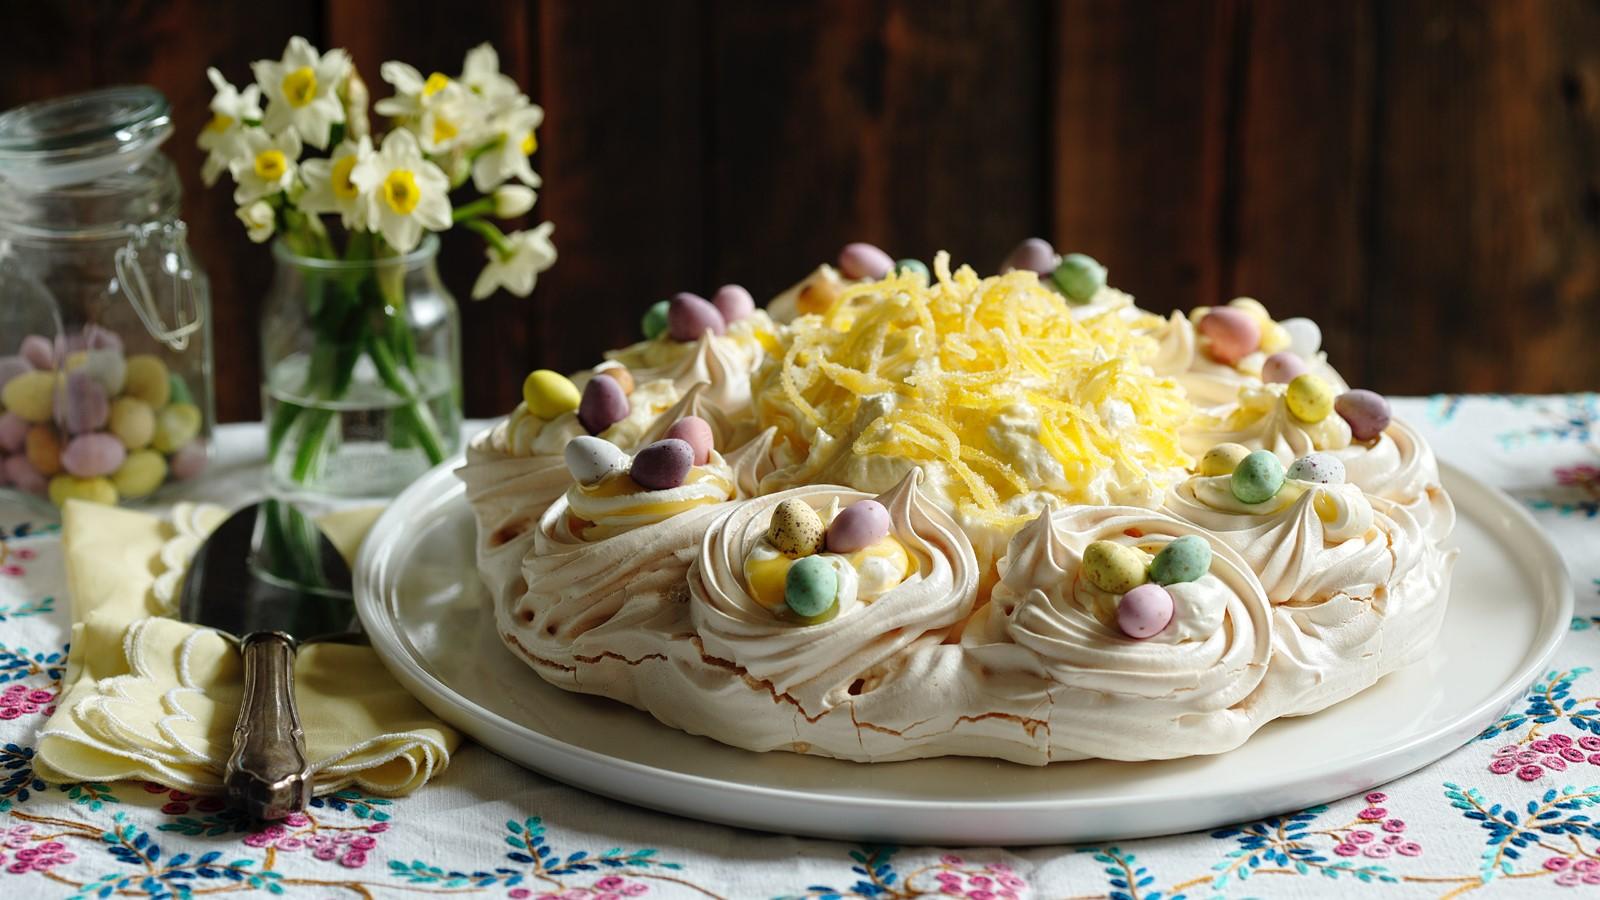 Une interprétation différente du gâteau Pavlova.